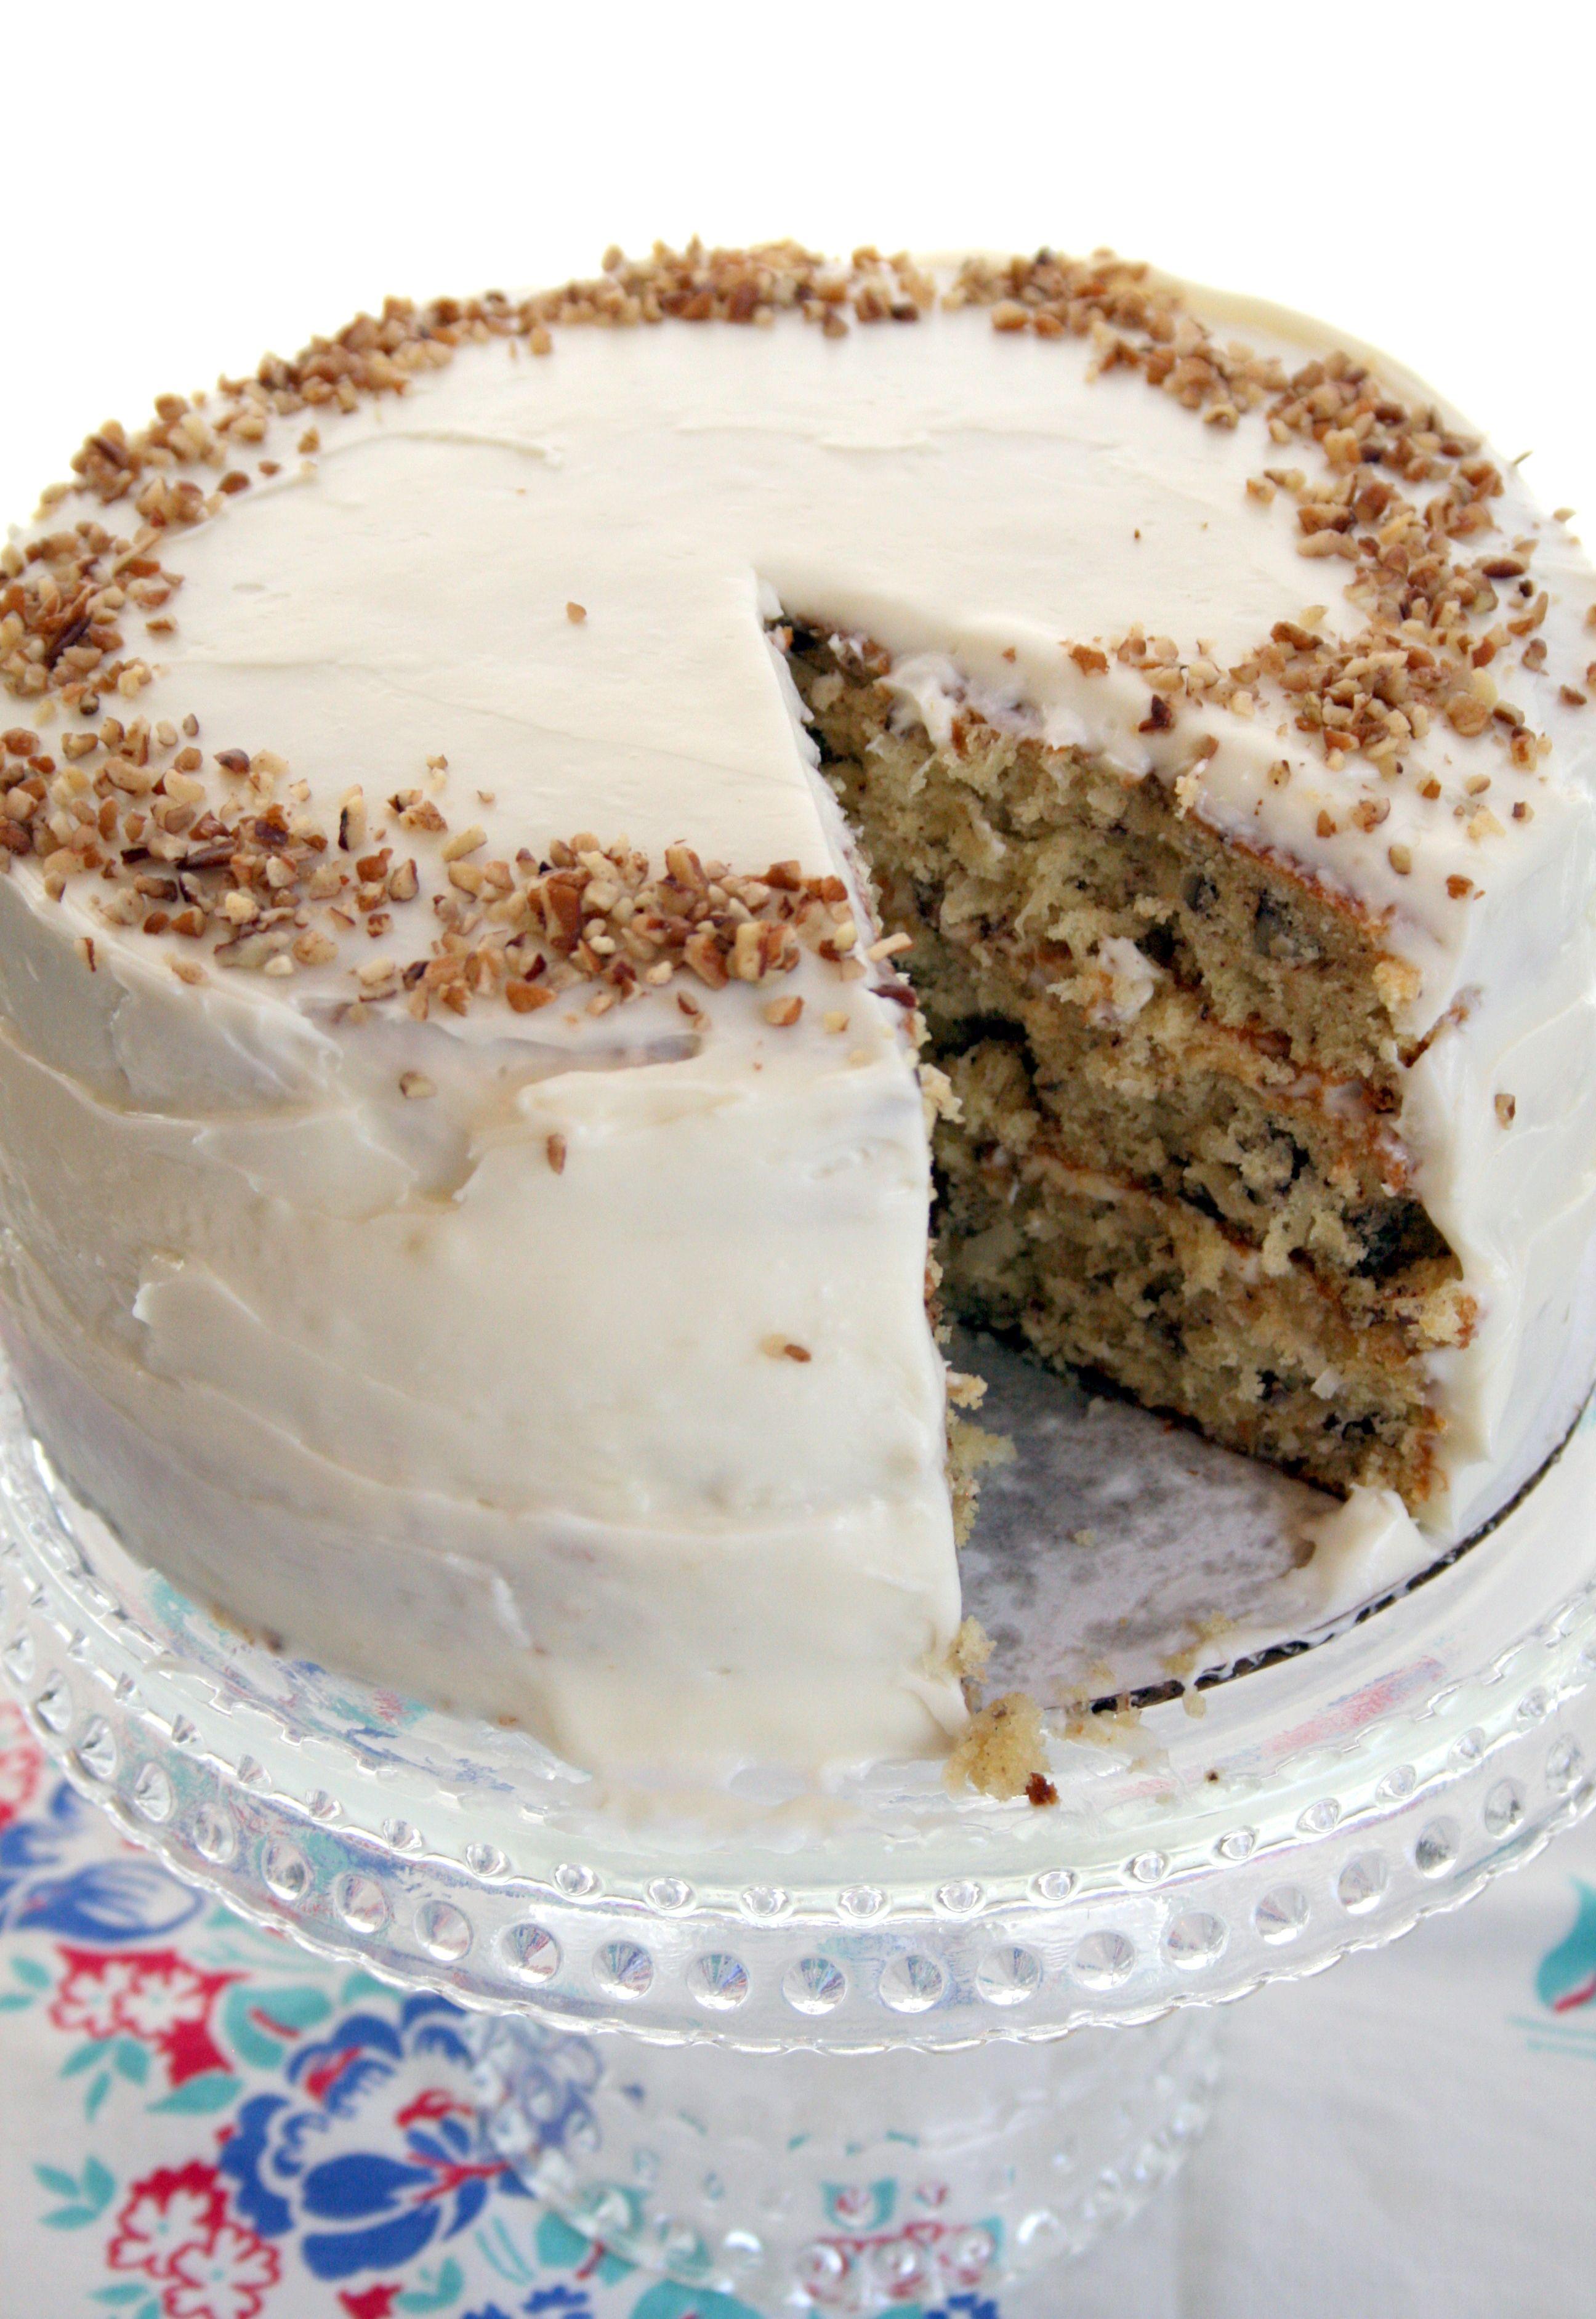 Italian Cream Cake This tender meltinyourmouth coconut cake